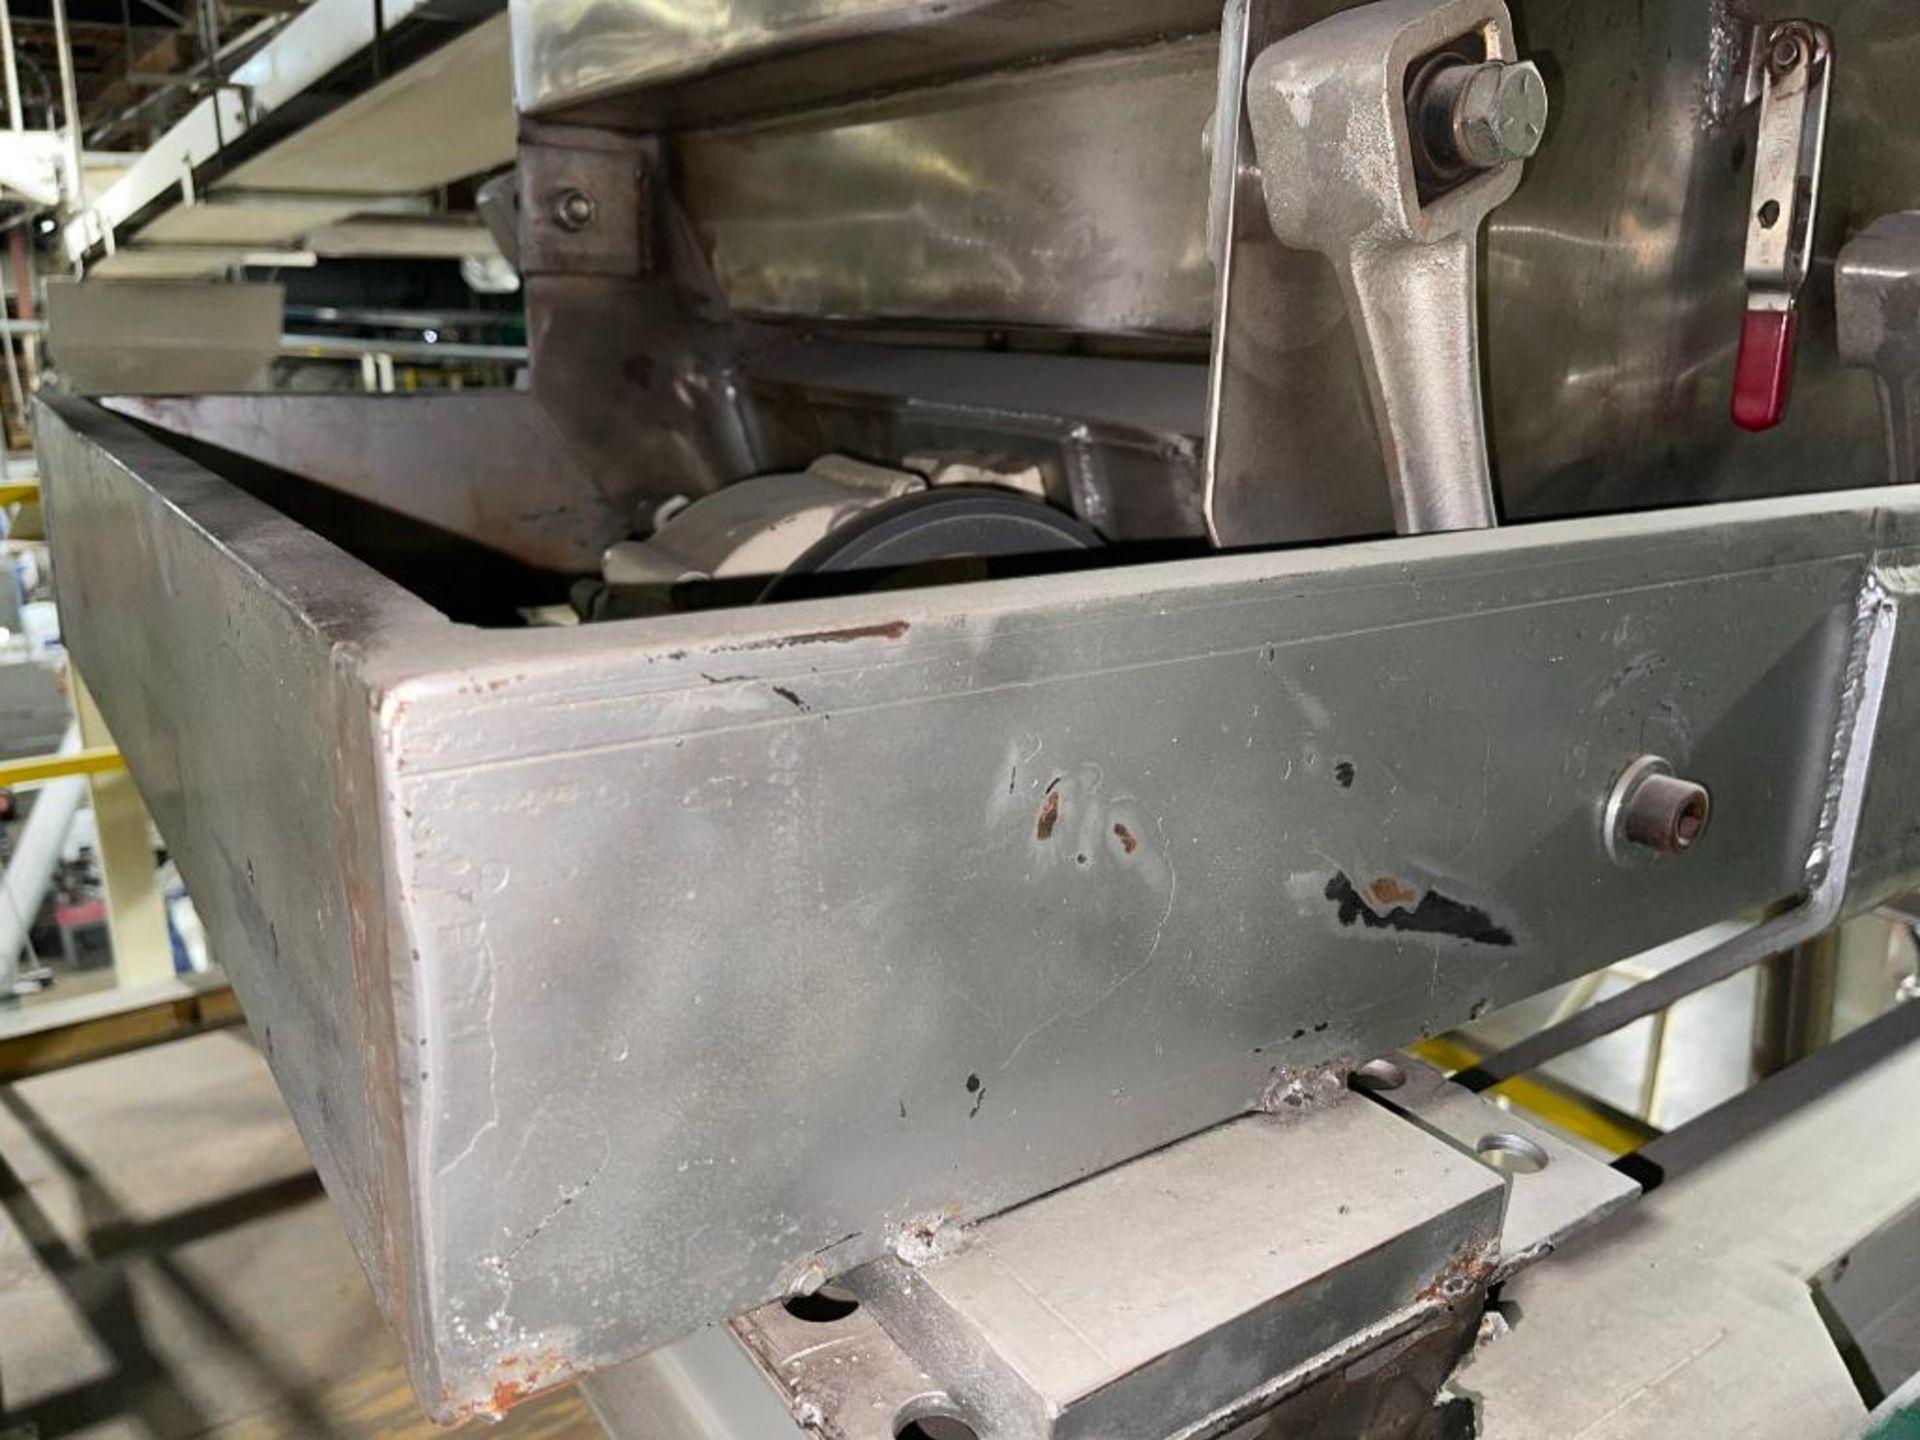 Eriez vibratory conveyor - Image 6 of 7